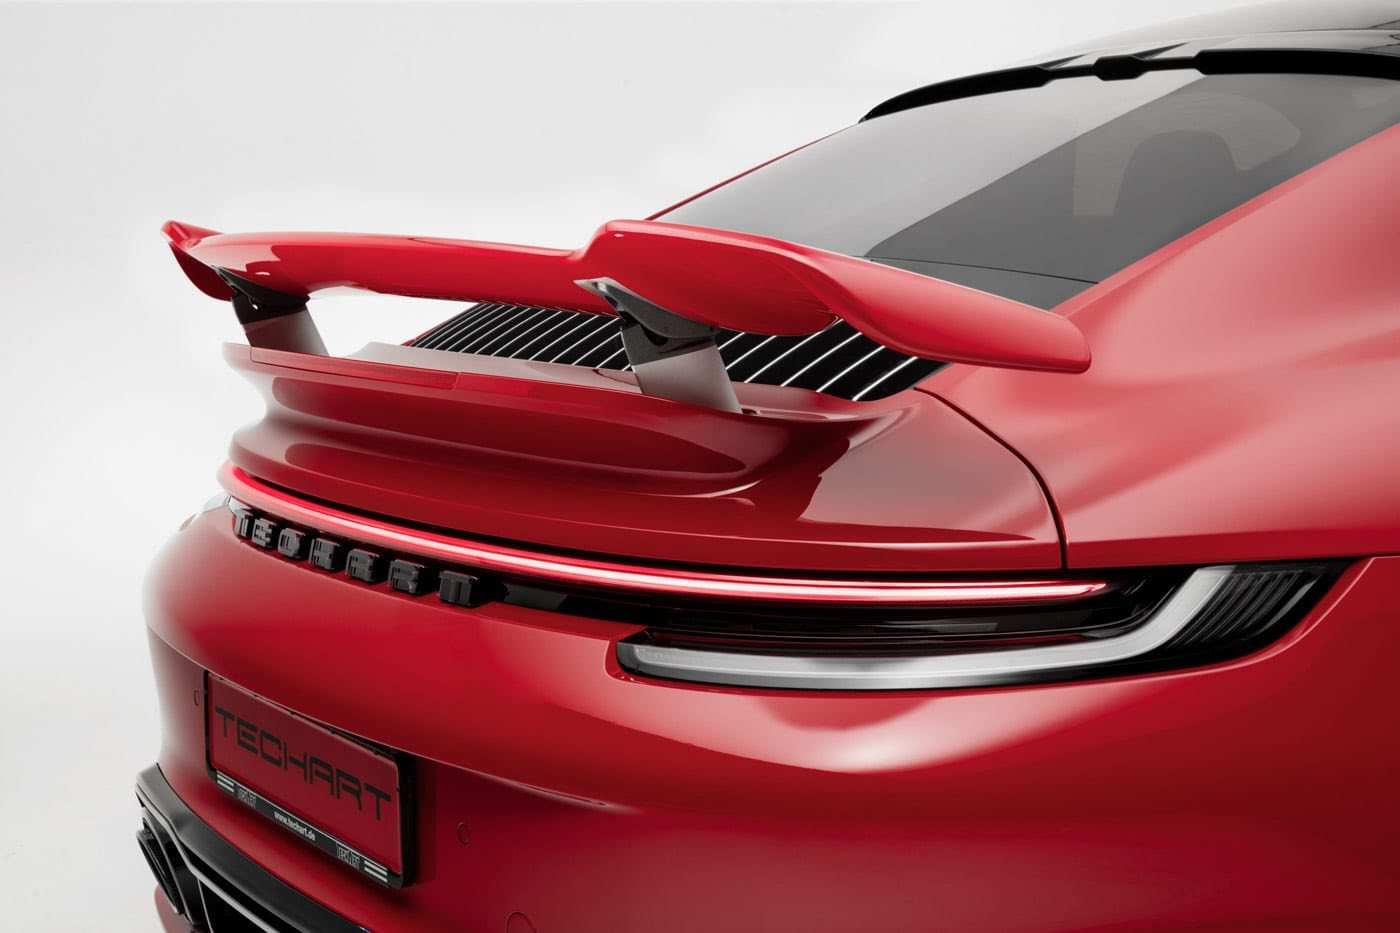 2021_Porsche_911_Turbo_S_by_TechArt_0009